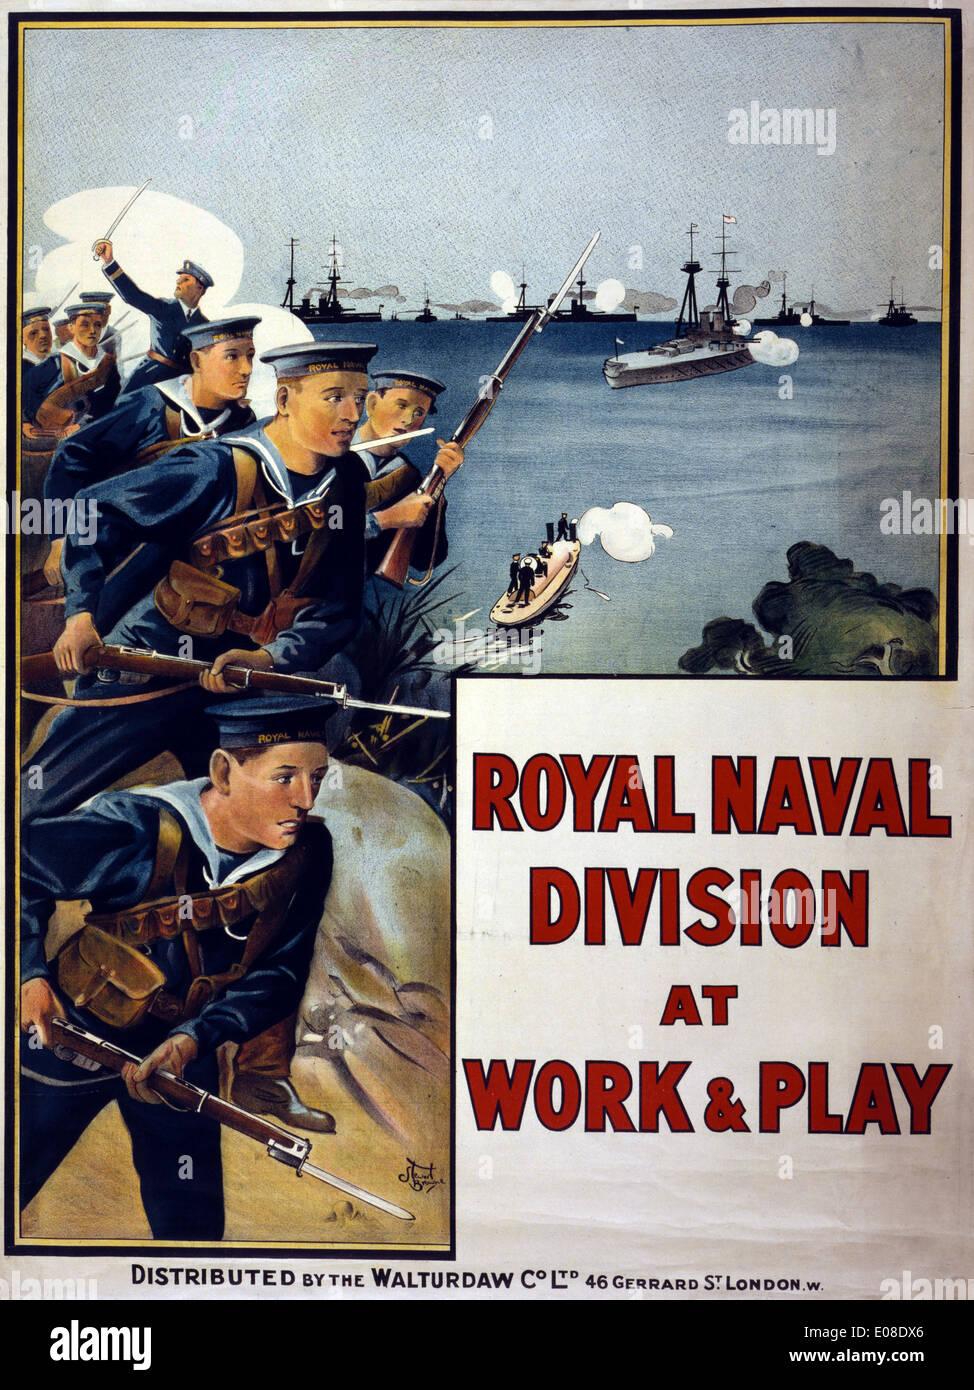 Royal Naval Division poster di reclutamento Immagini Stock